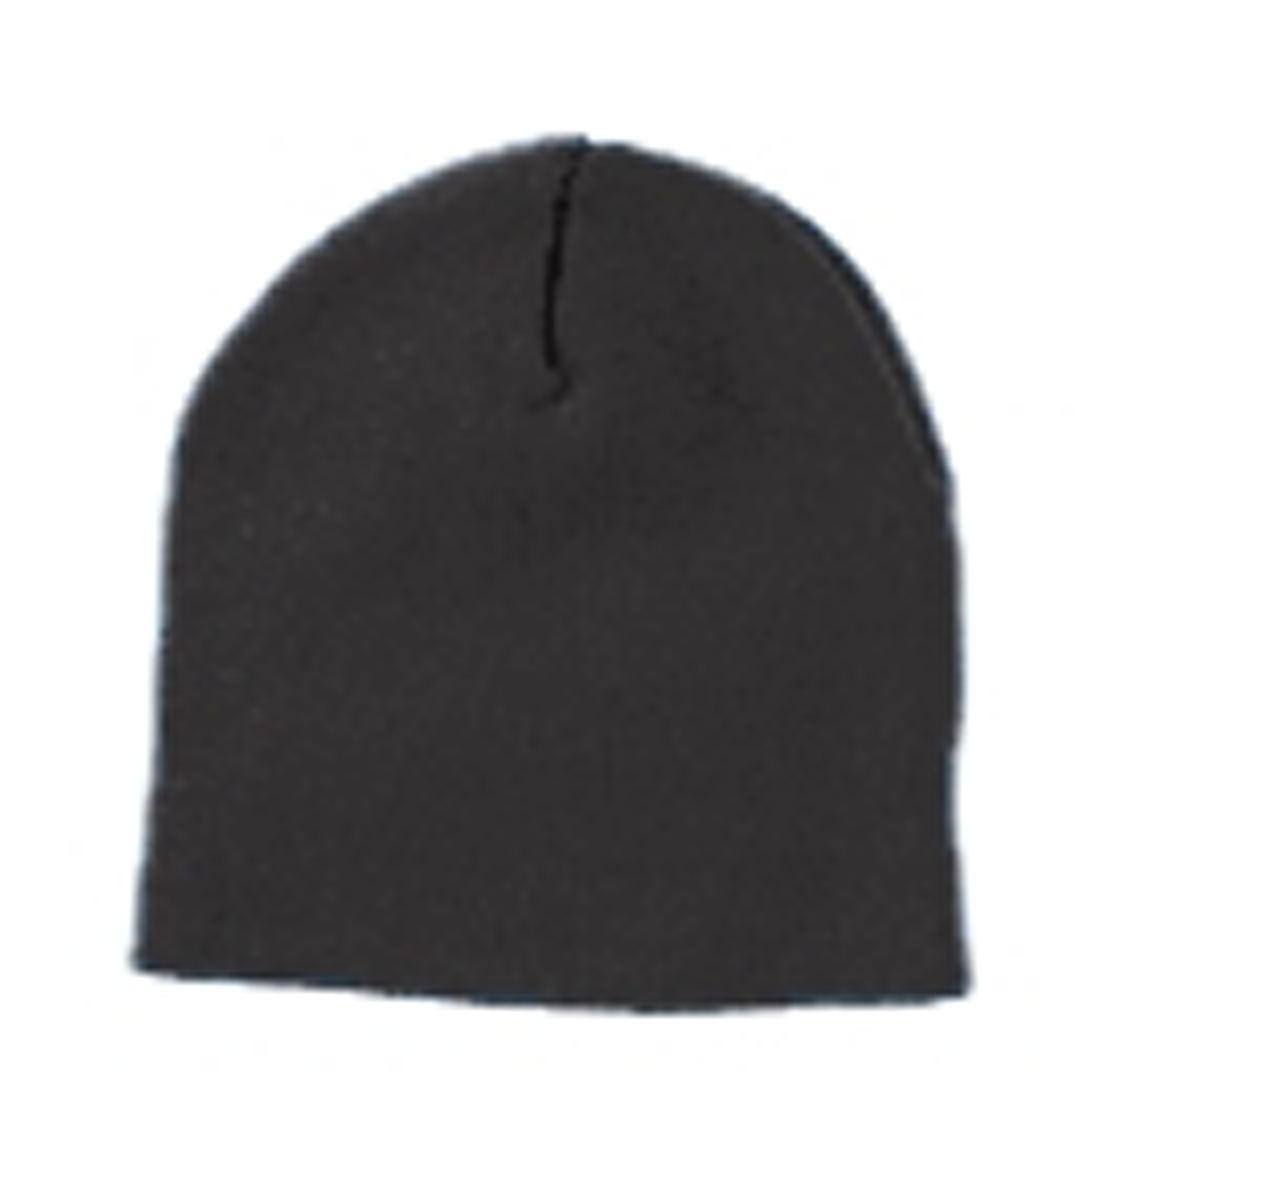 Yupoong 1500 Yupoong Knit Cap